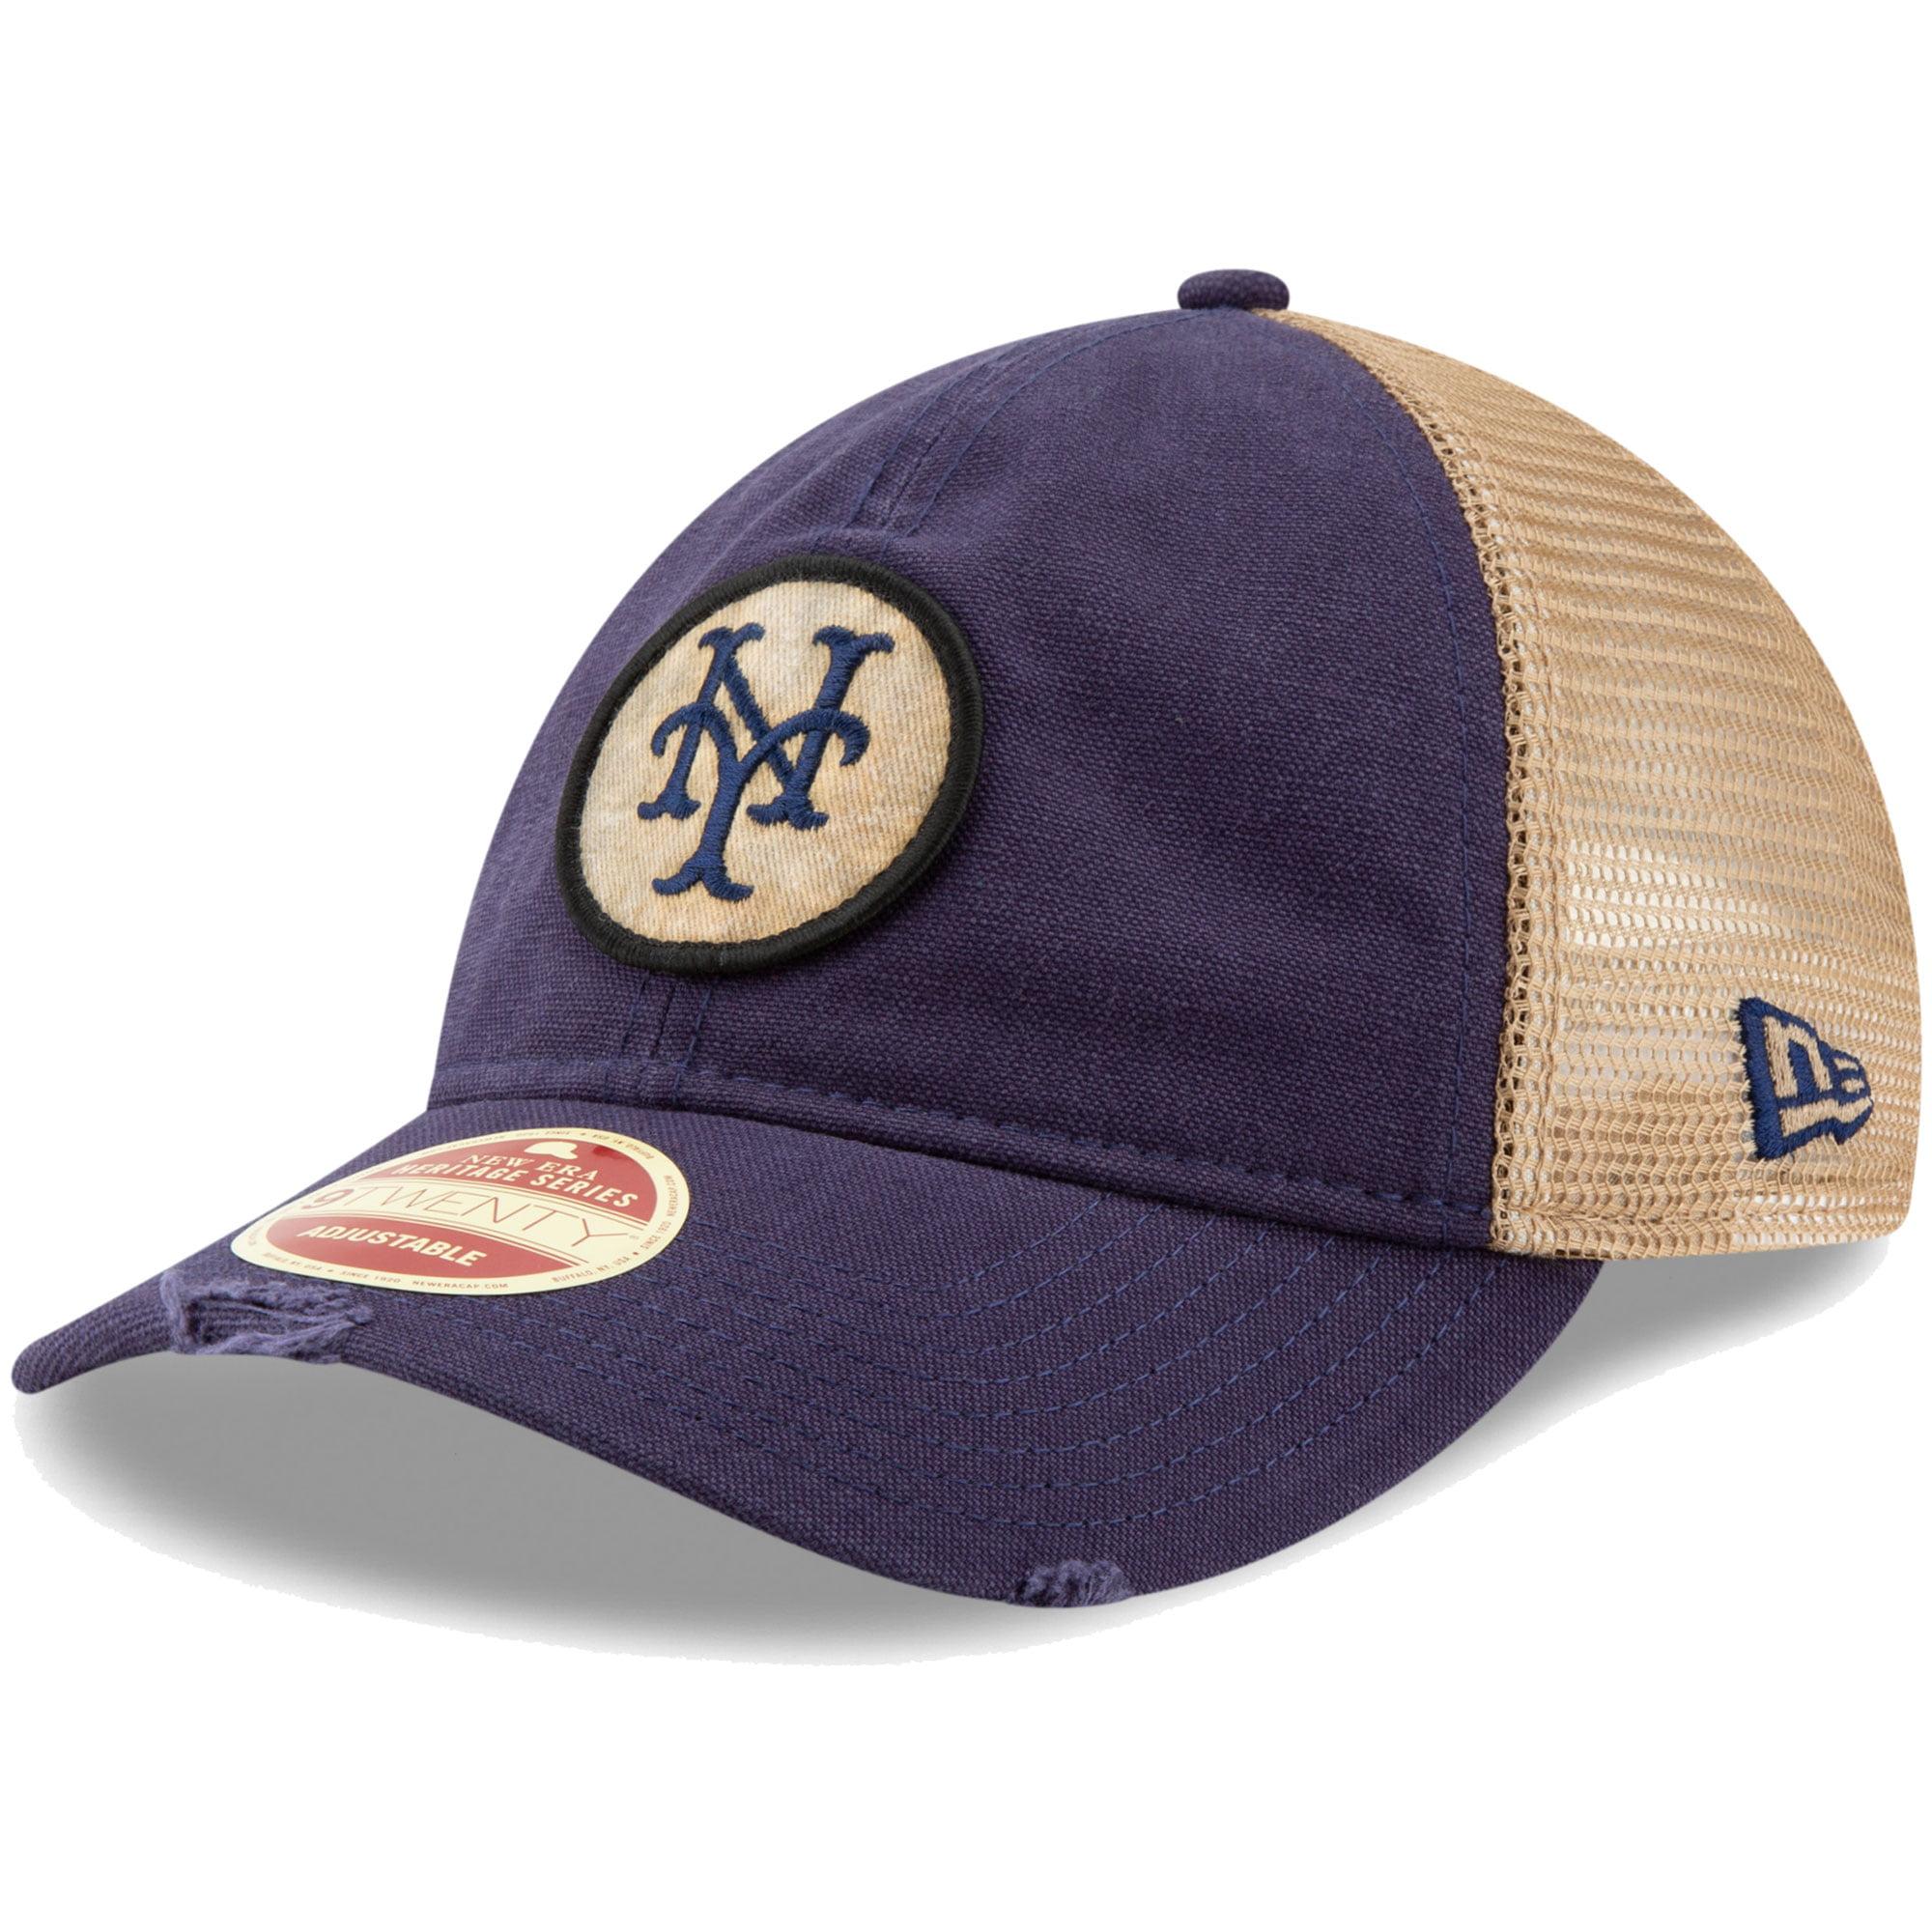 New York Mets New Era Cooperstown Collection Front Patched Trucker 9TWENTY Adjustable Hat - Navy - OSFA